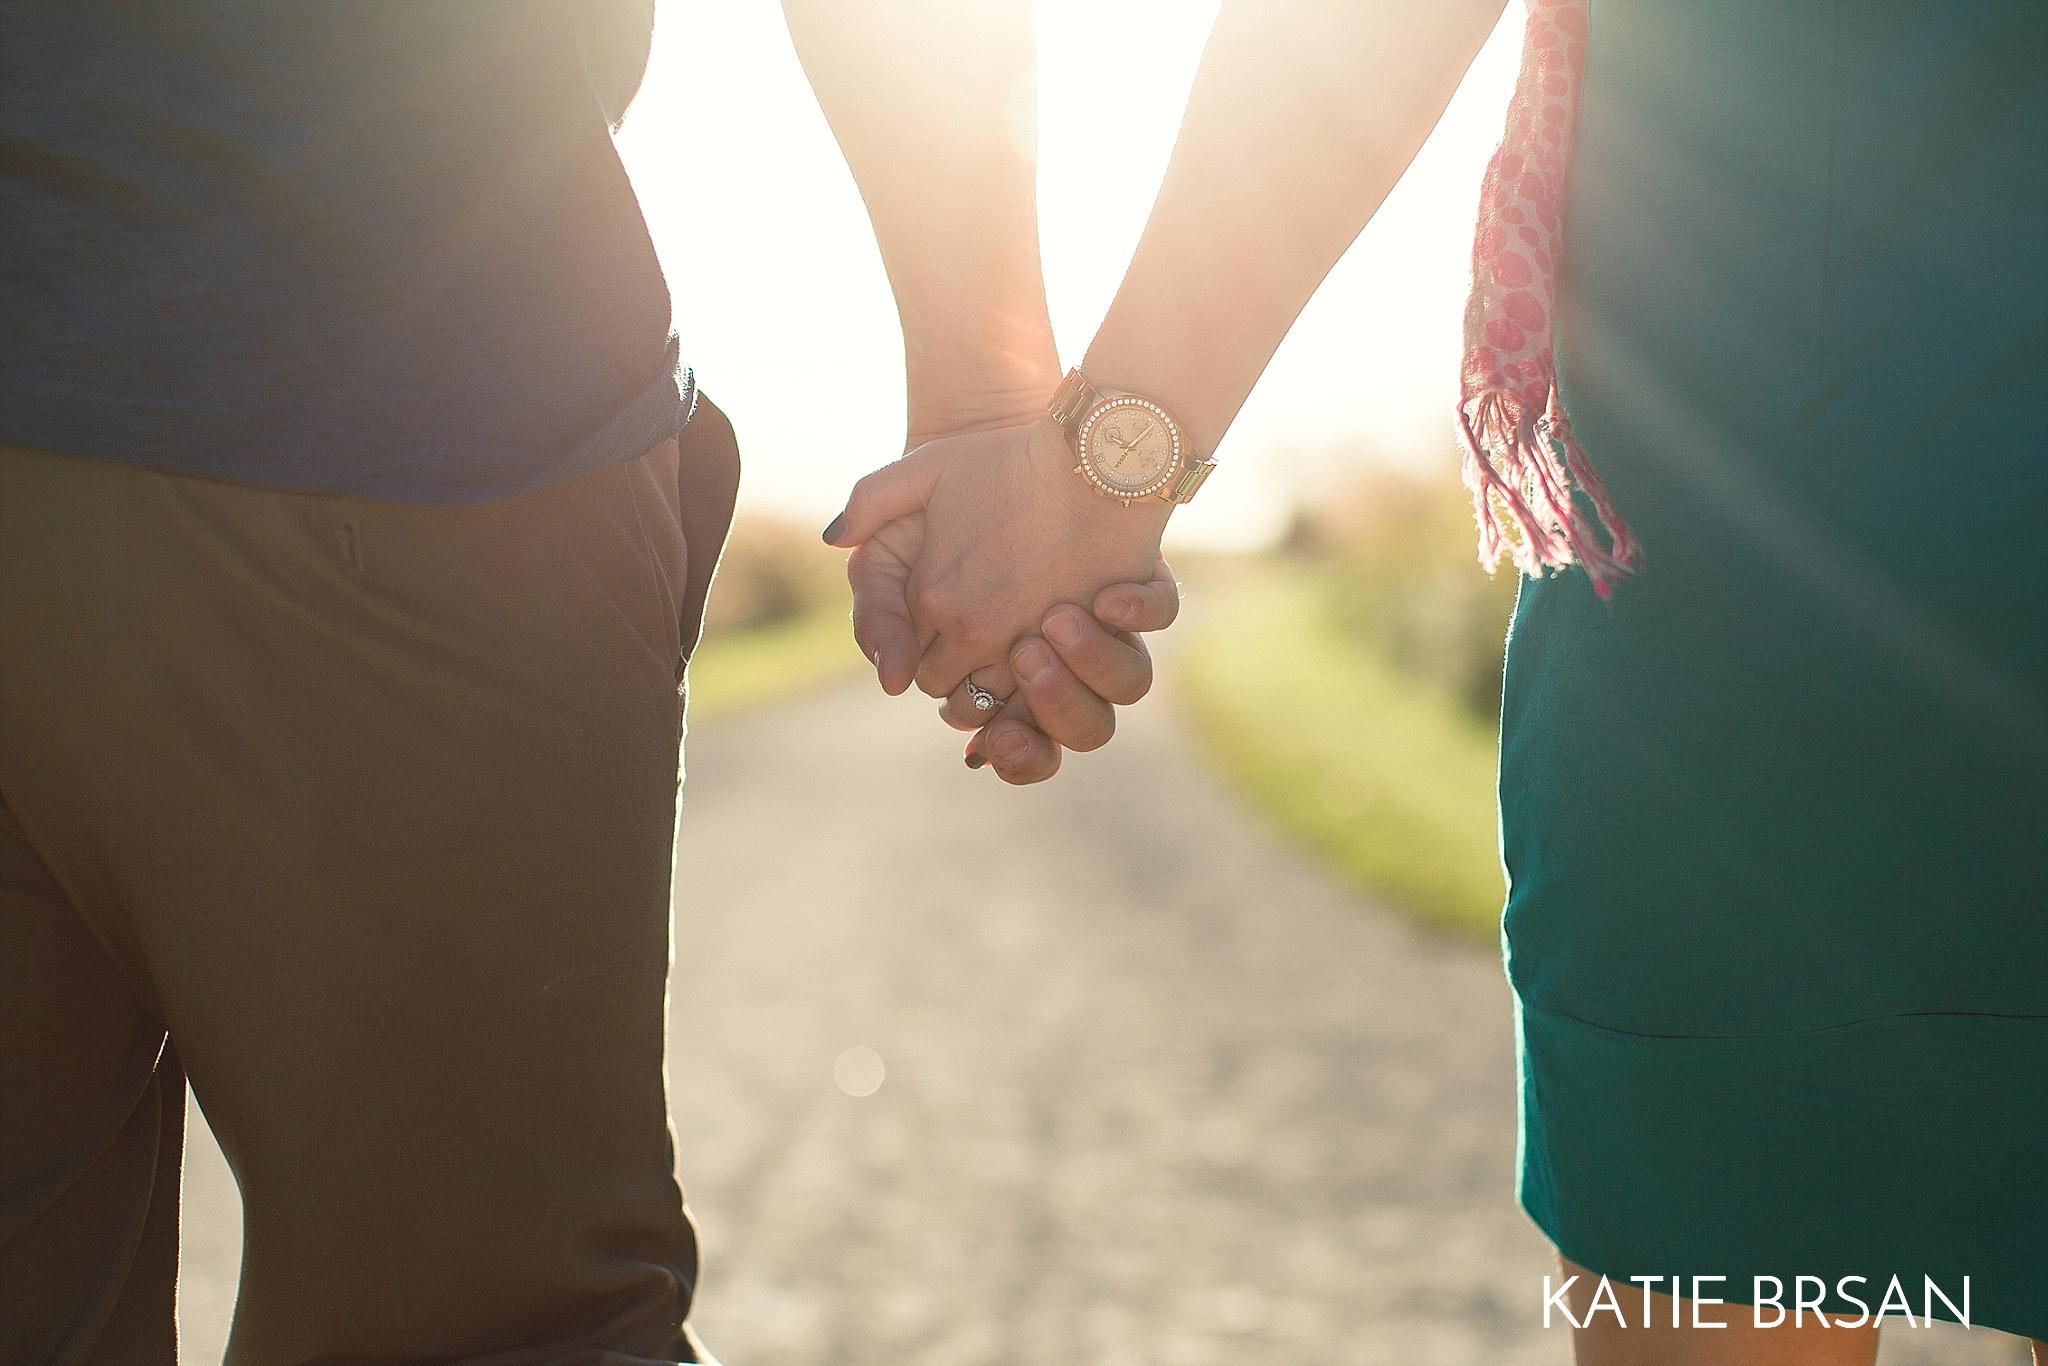 KatieBrsan-Chicago-Suburban-EngagementPictures-HadlyValley_0575.jpg